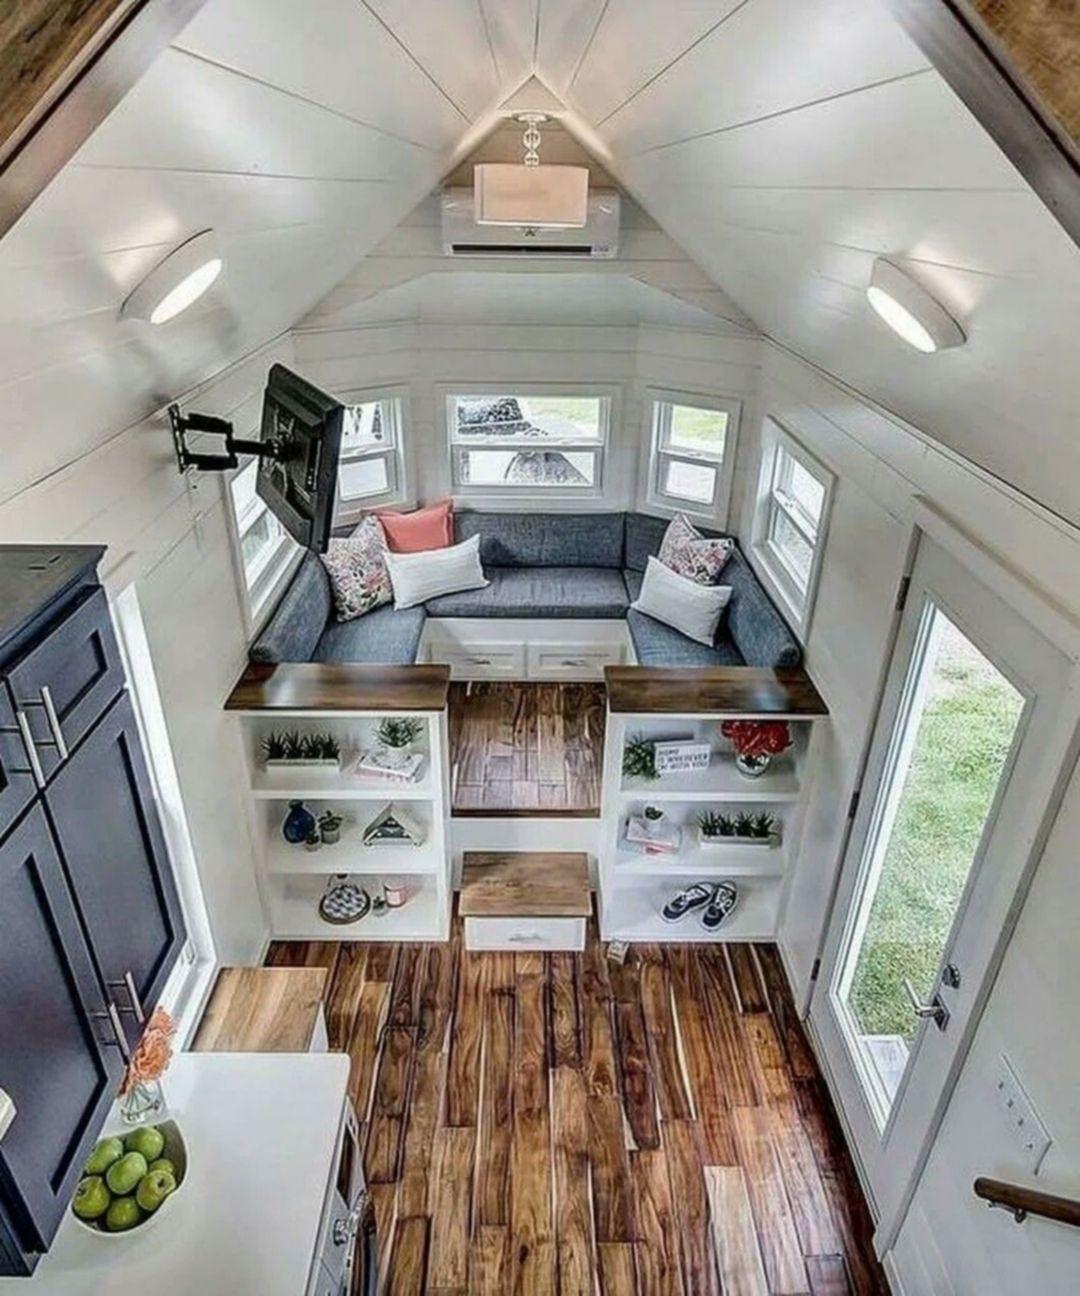 30 Simple Tiny House Interior Ideas For Inspiration Tiny House Living Tiny House Storage Tiny House Design